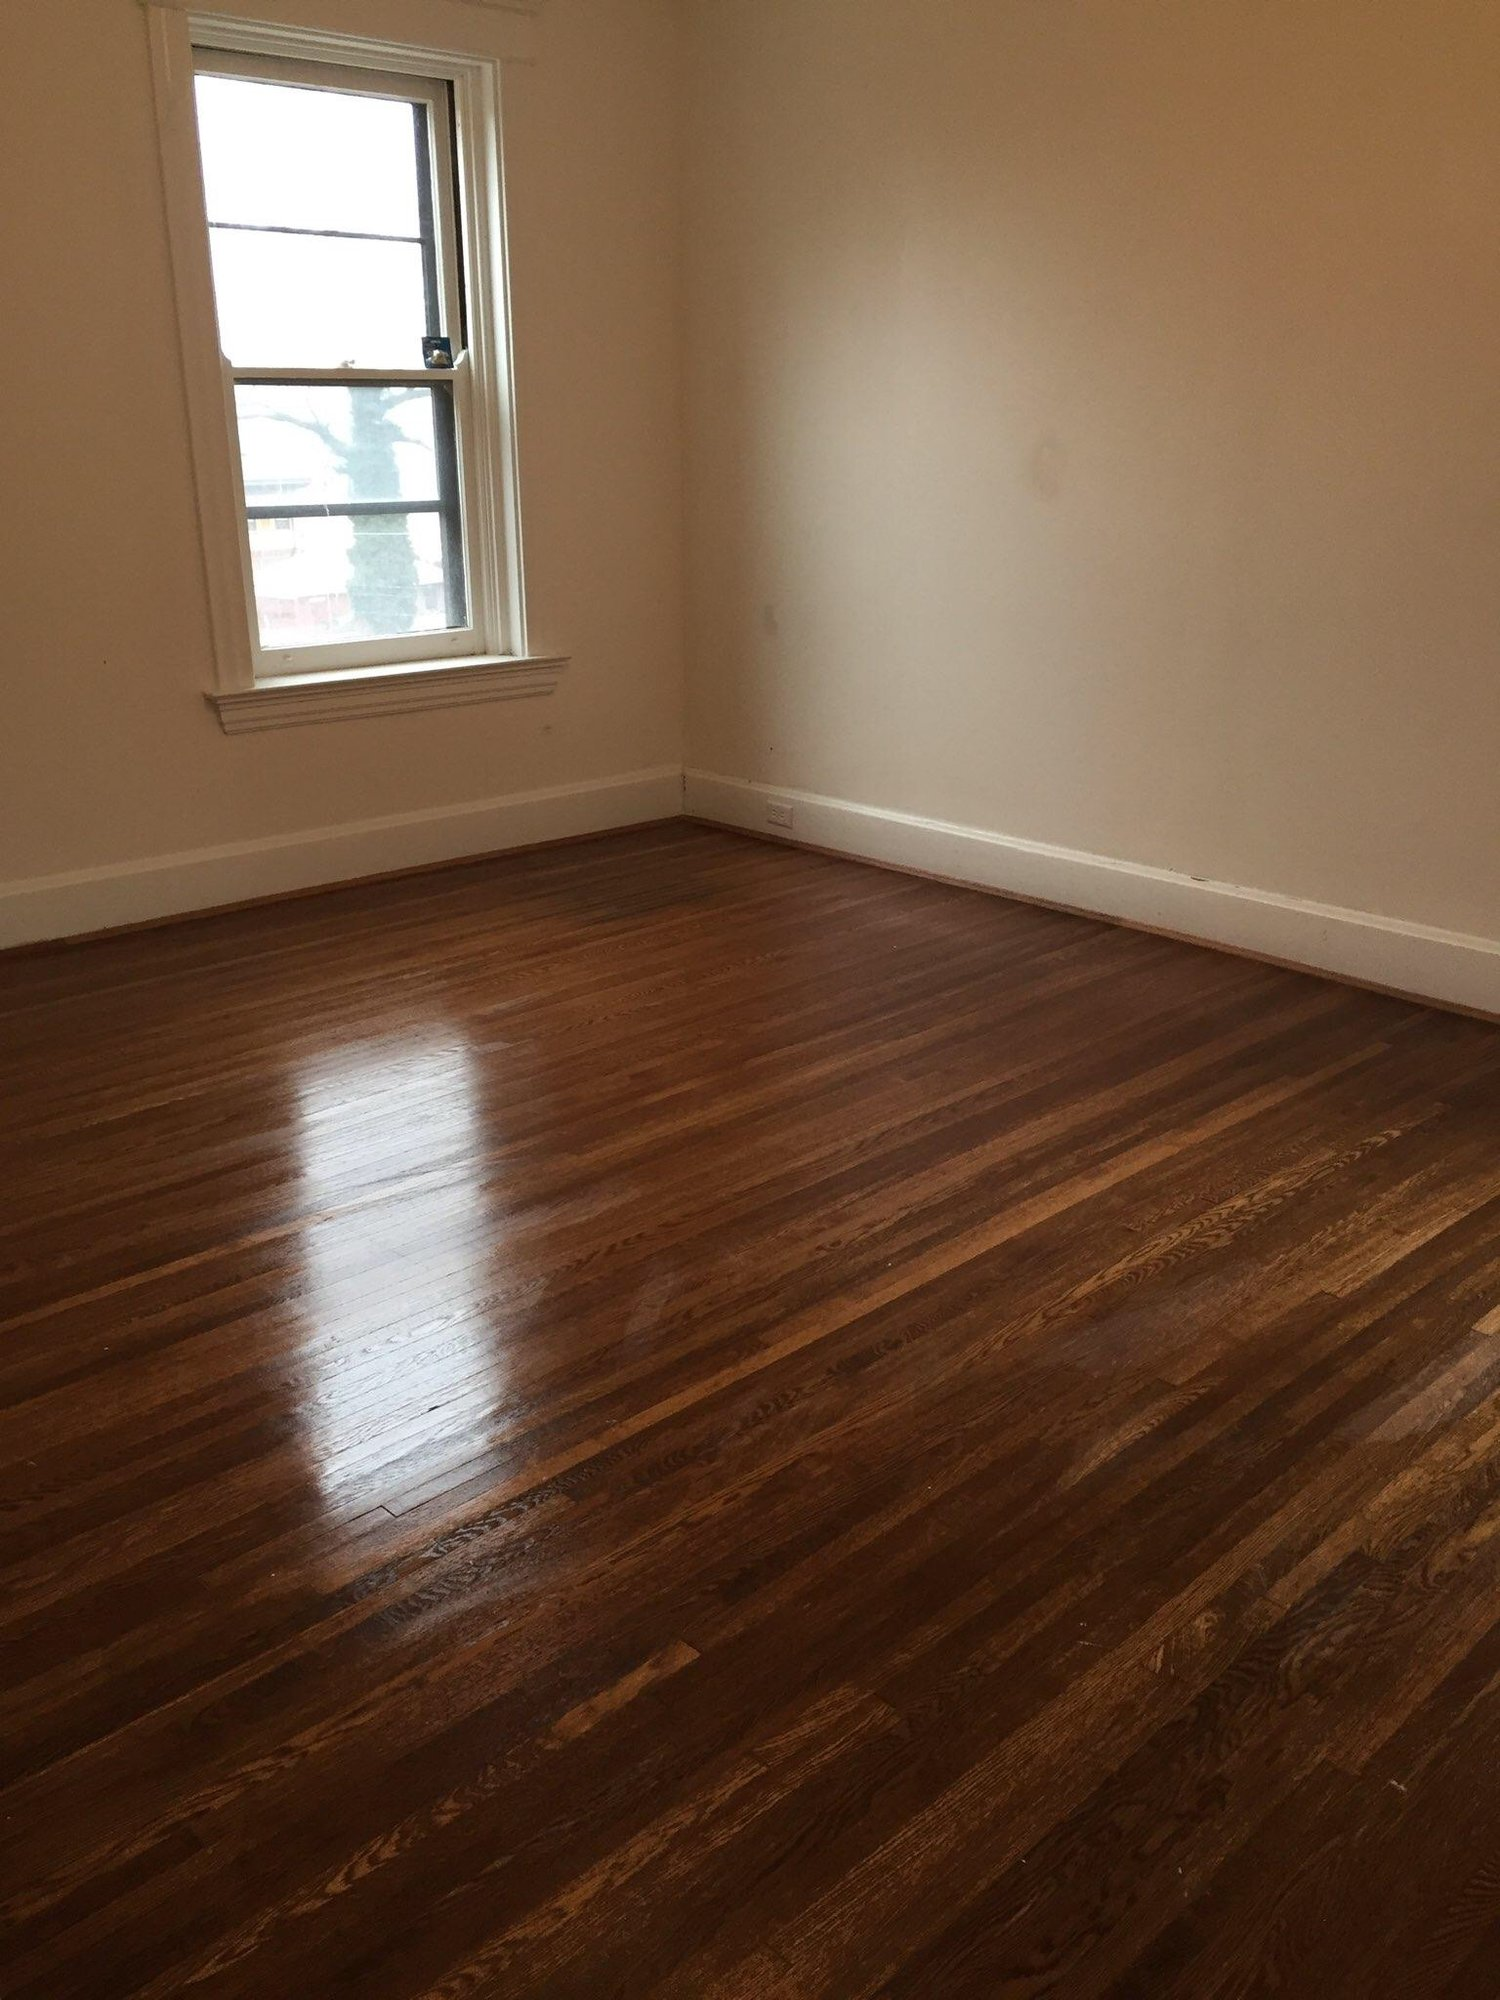 Hardwood Floors - After